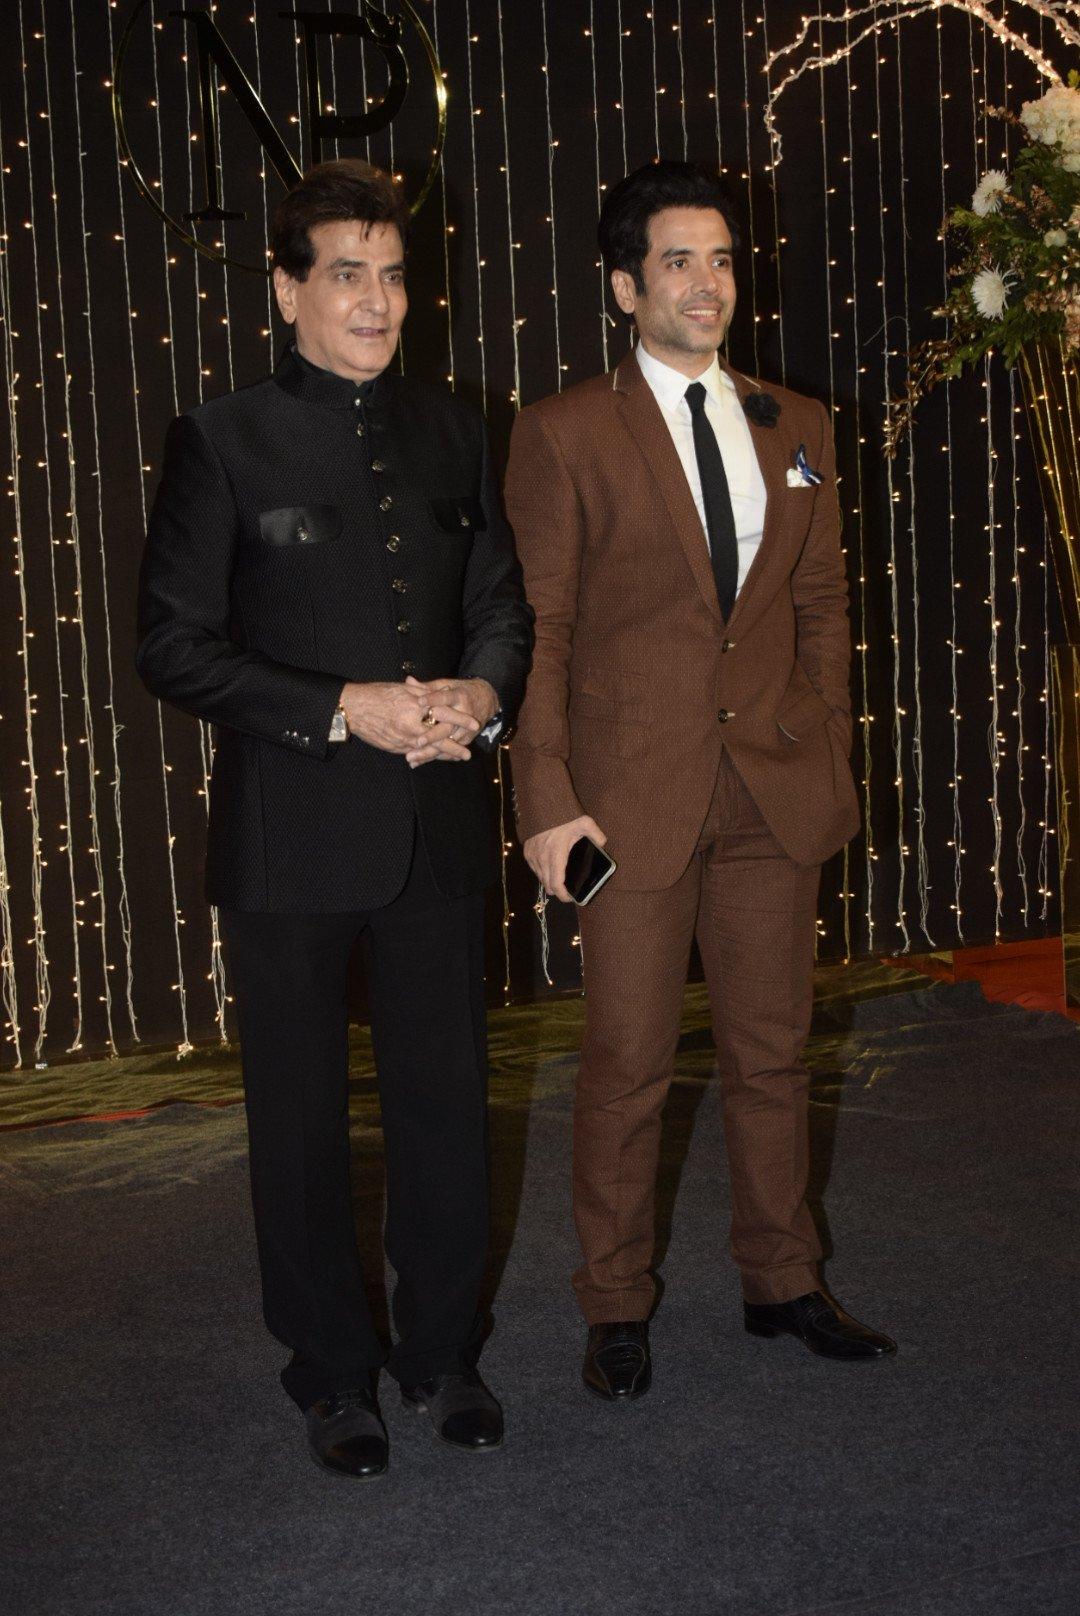 In Pics: Celebrities attend Priyanka Chopra and Nick Jonas wedding reception in Mumbai